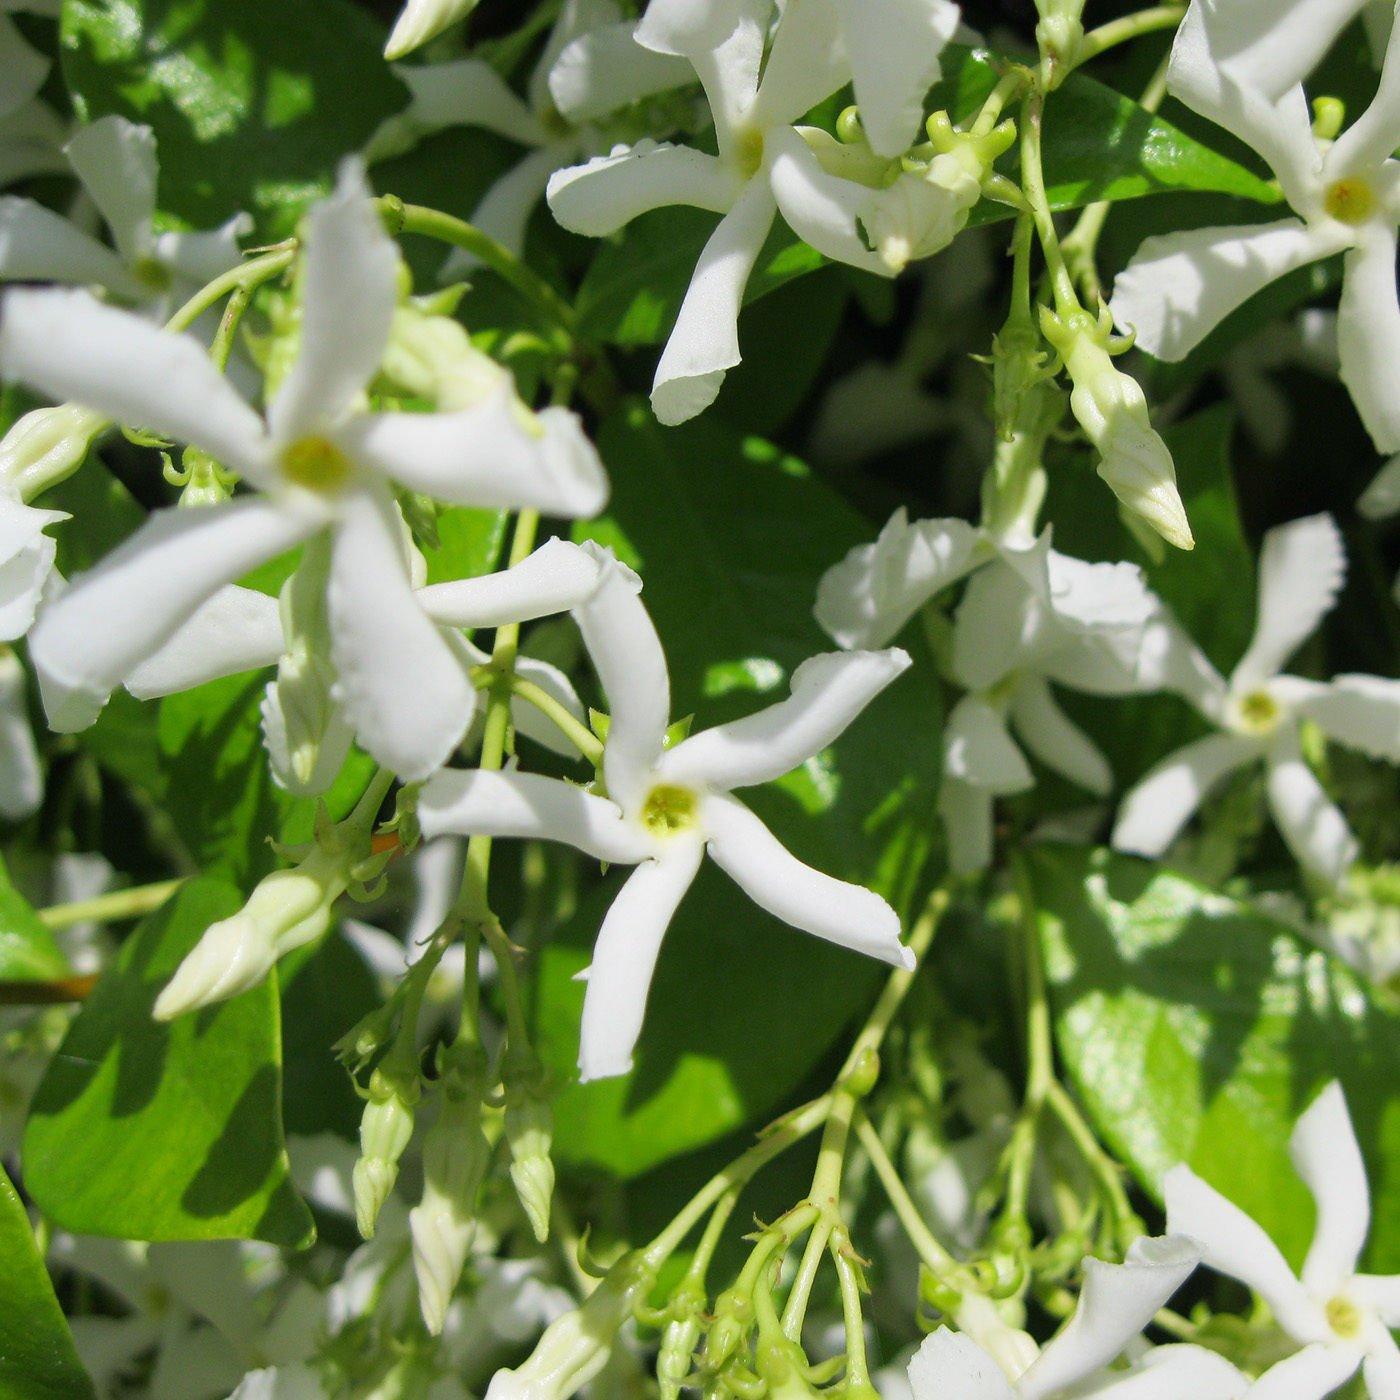 Star Jasmine Vine Plant - Trachelospermum Jasminoides - Highly Fragrant